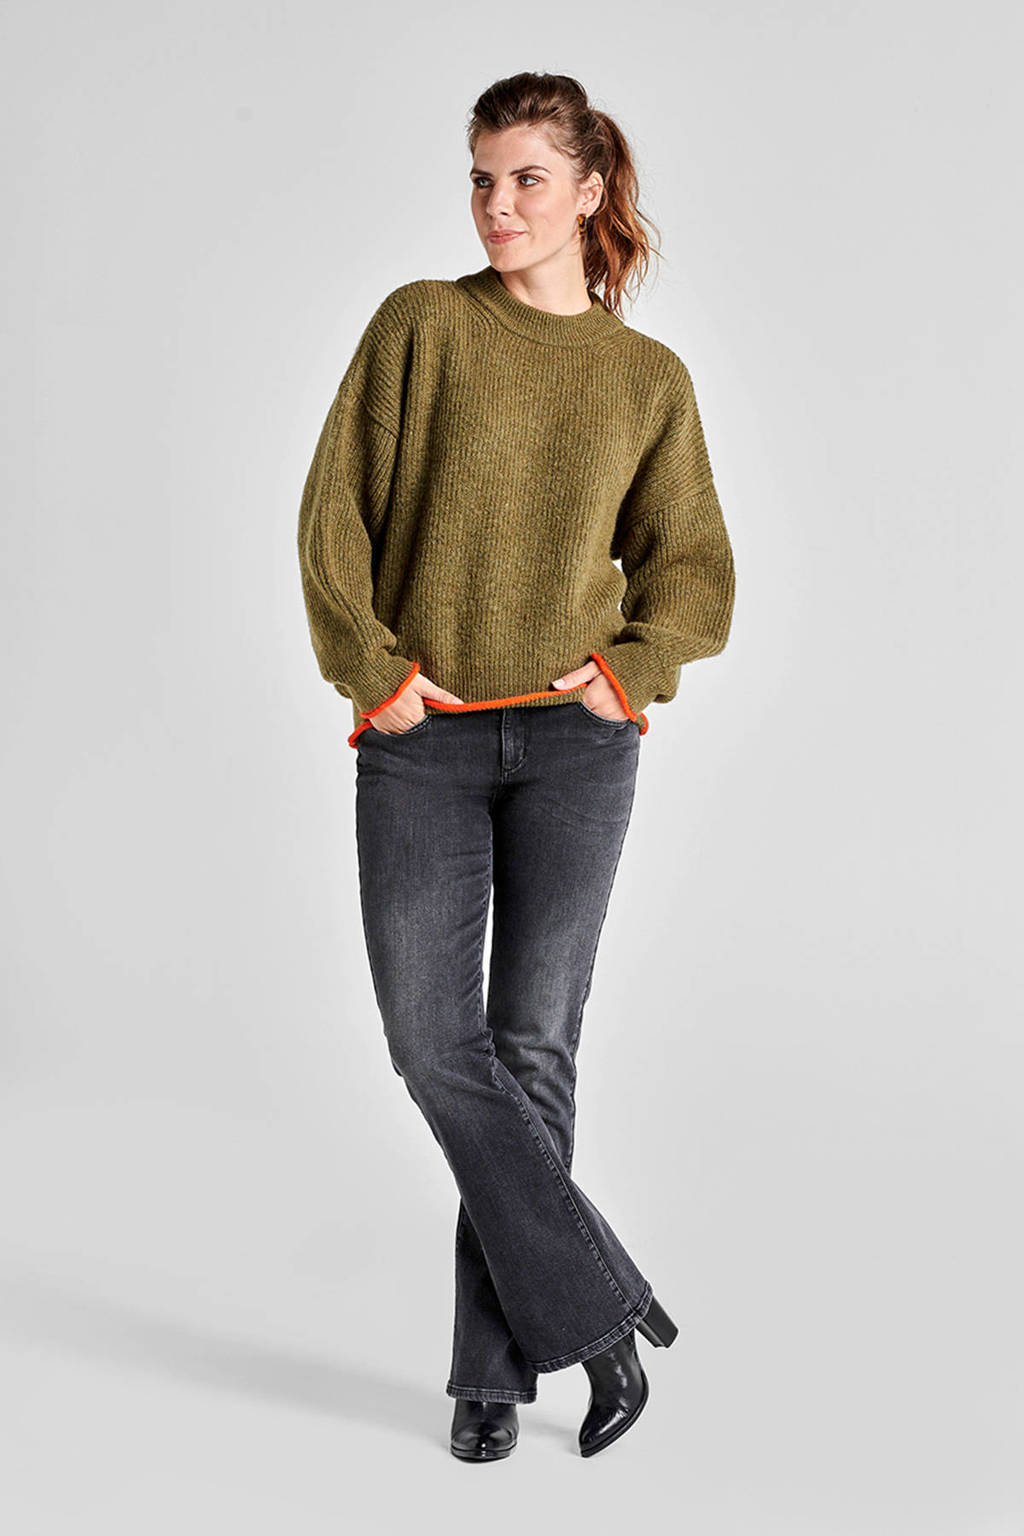 Miss Etam Regulier trui met contrastbies groen, Groen